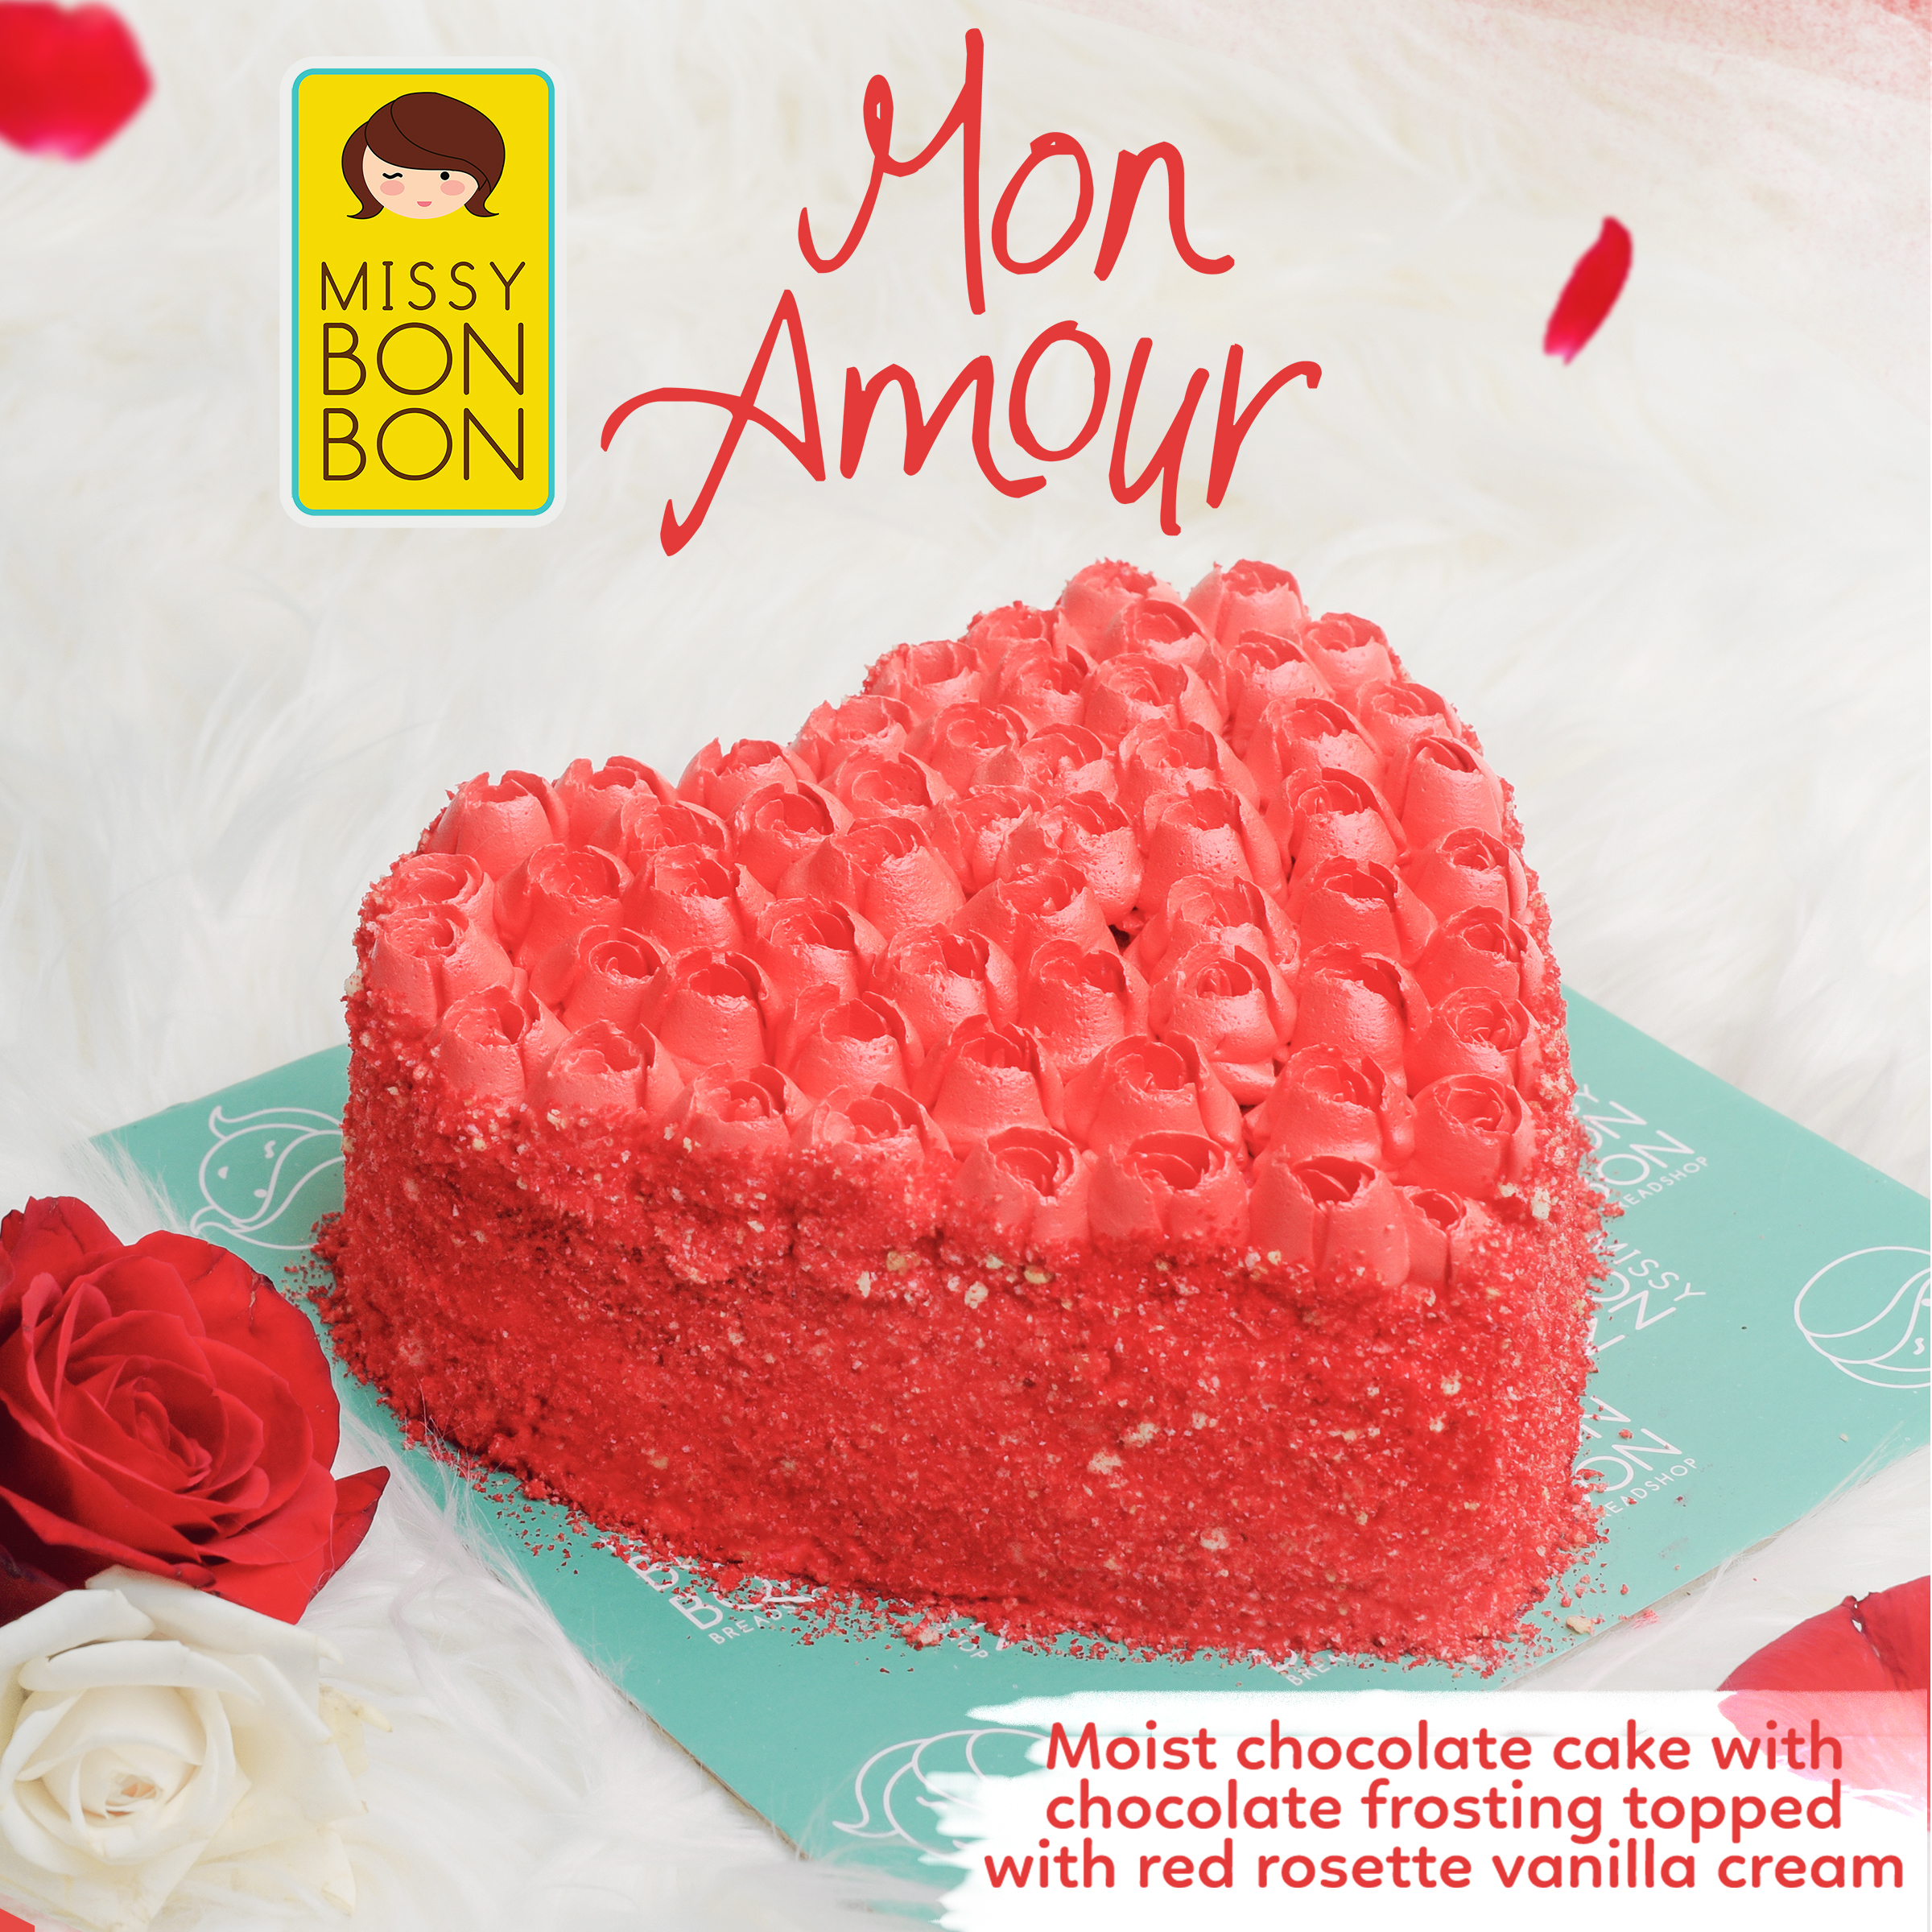 MBB Valentines Cake_Socmed copy